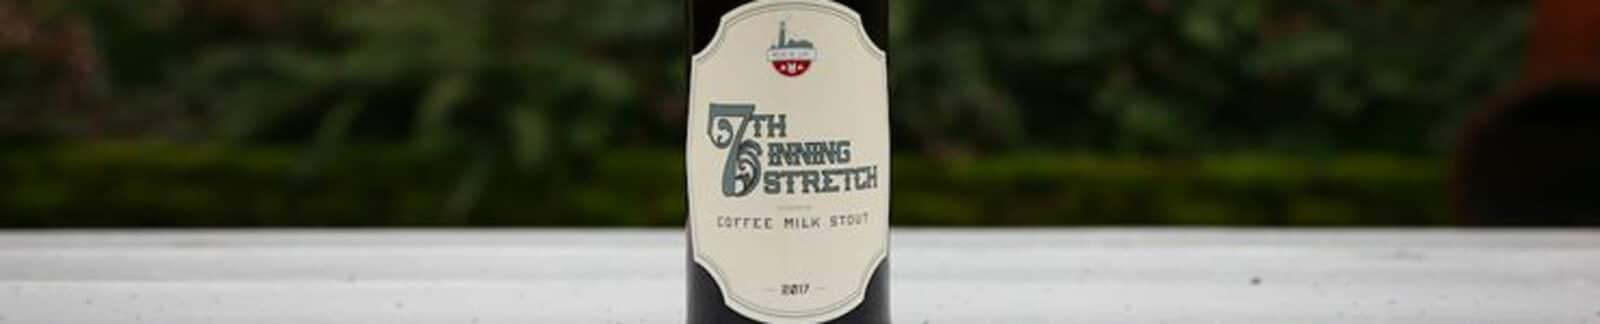 7th Inning Stretch Coffee Milk Stout header